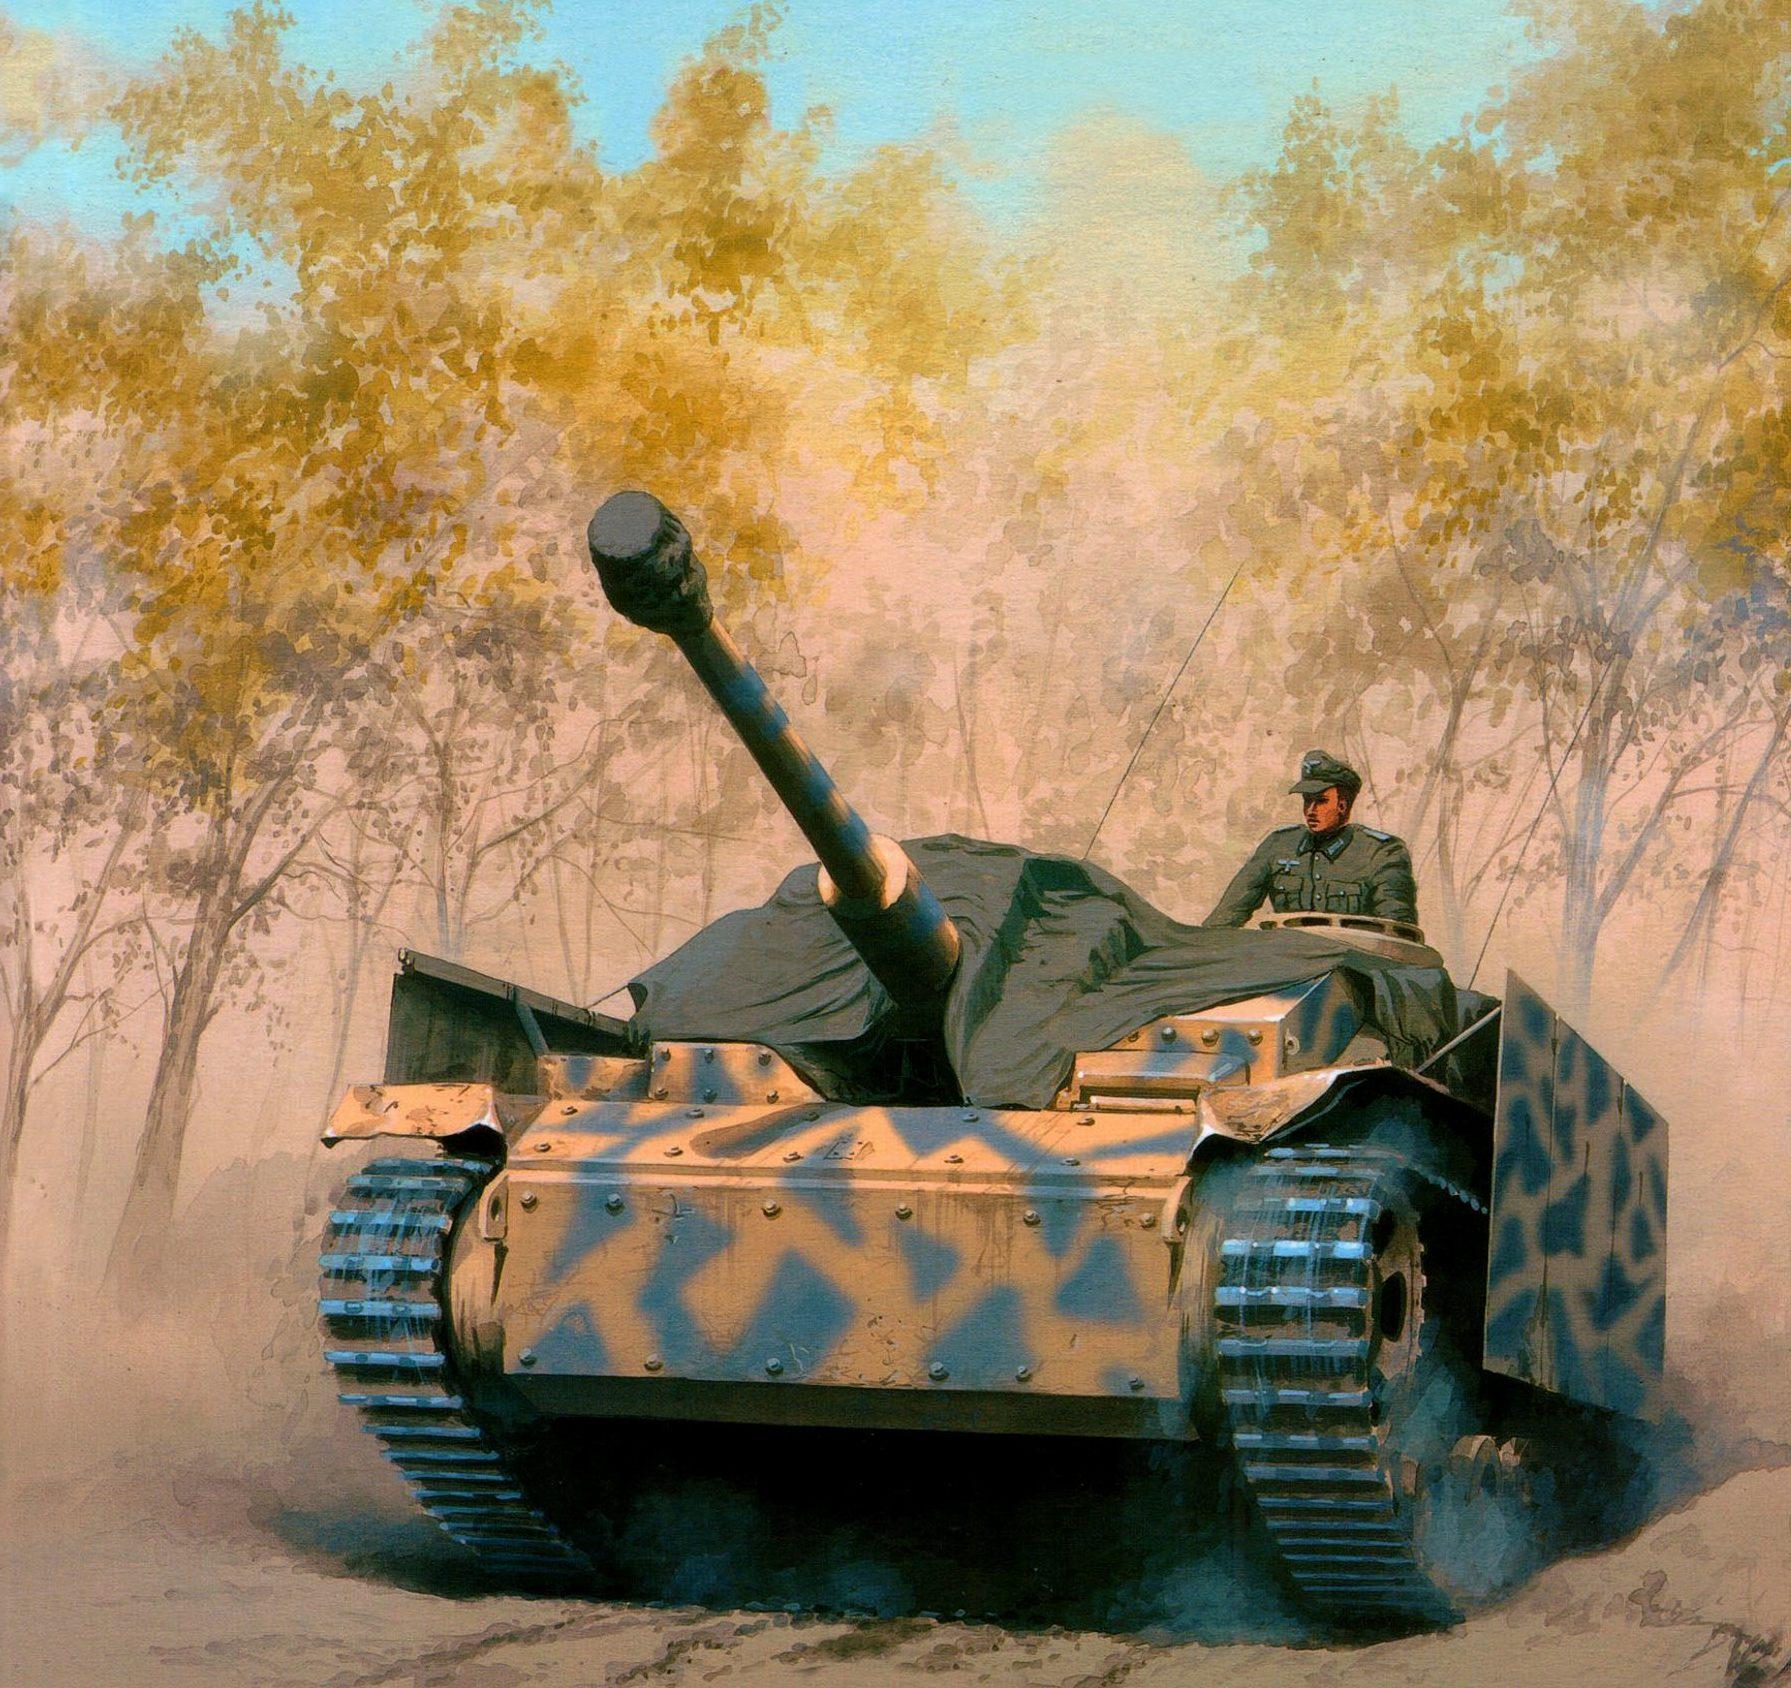 Wróbel Arkadiusz. САУ StuG 40 Ausf. G.